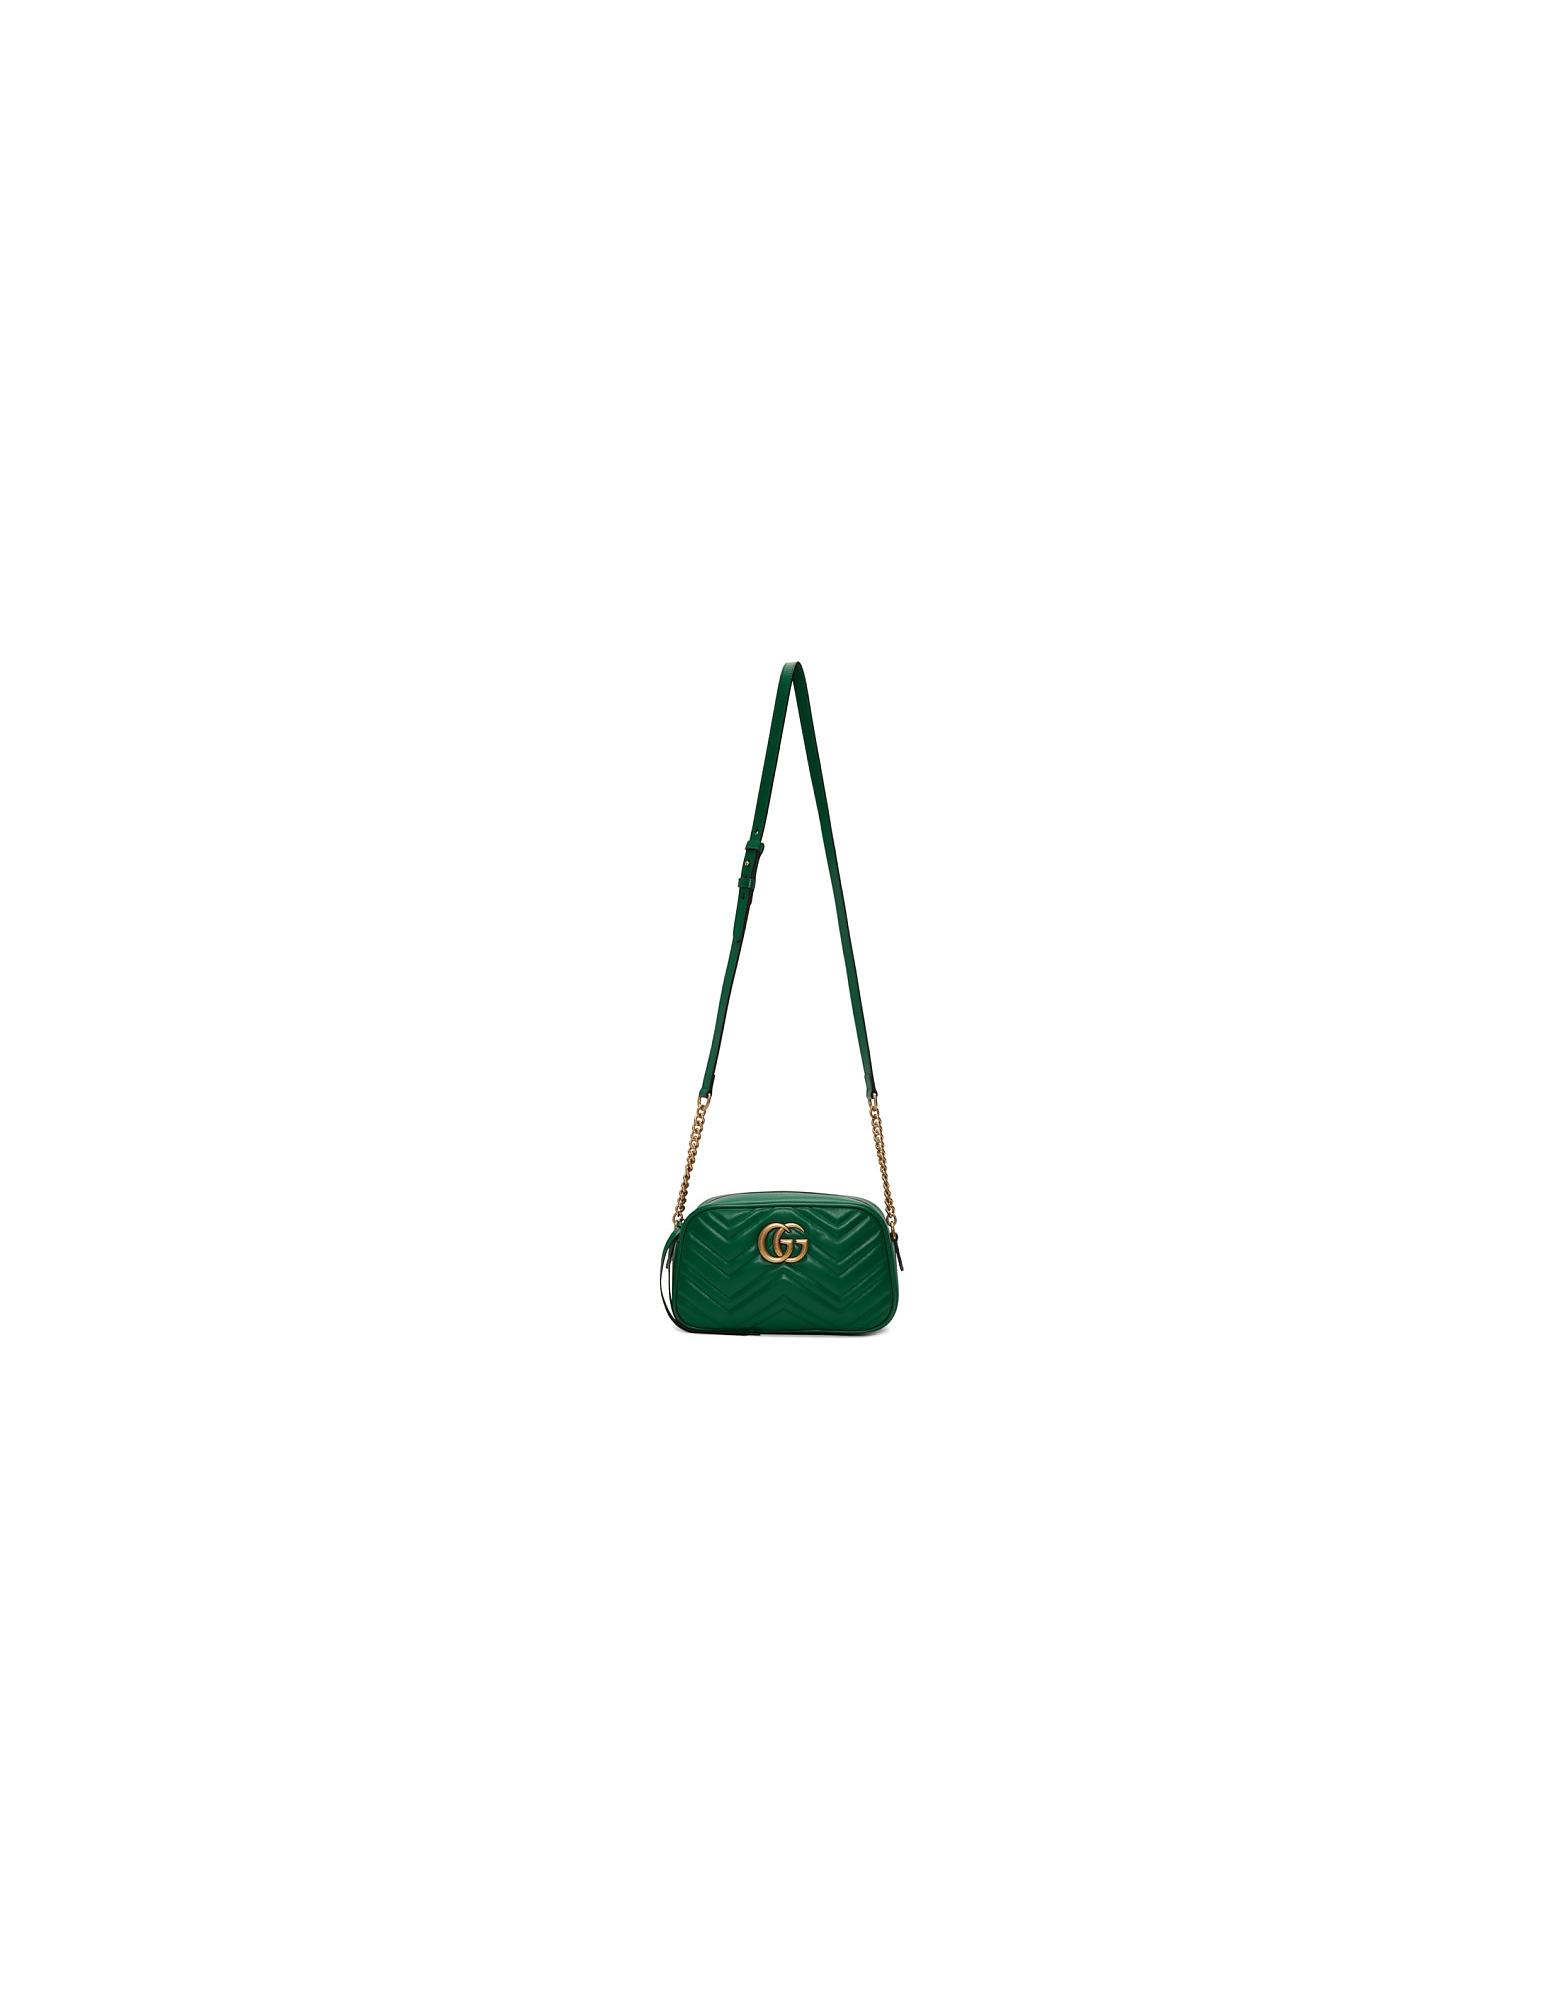 Gucci Designer Handbags, Green Small GG Marmont Camera Bag